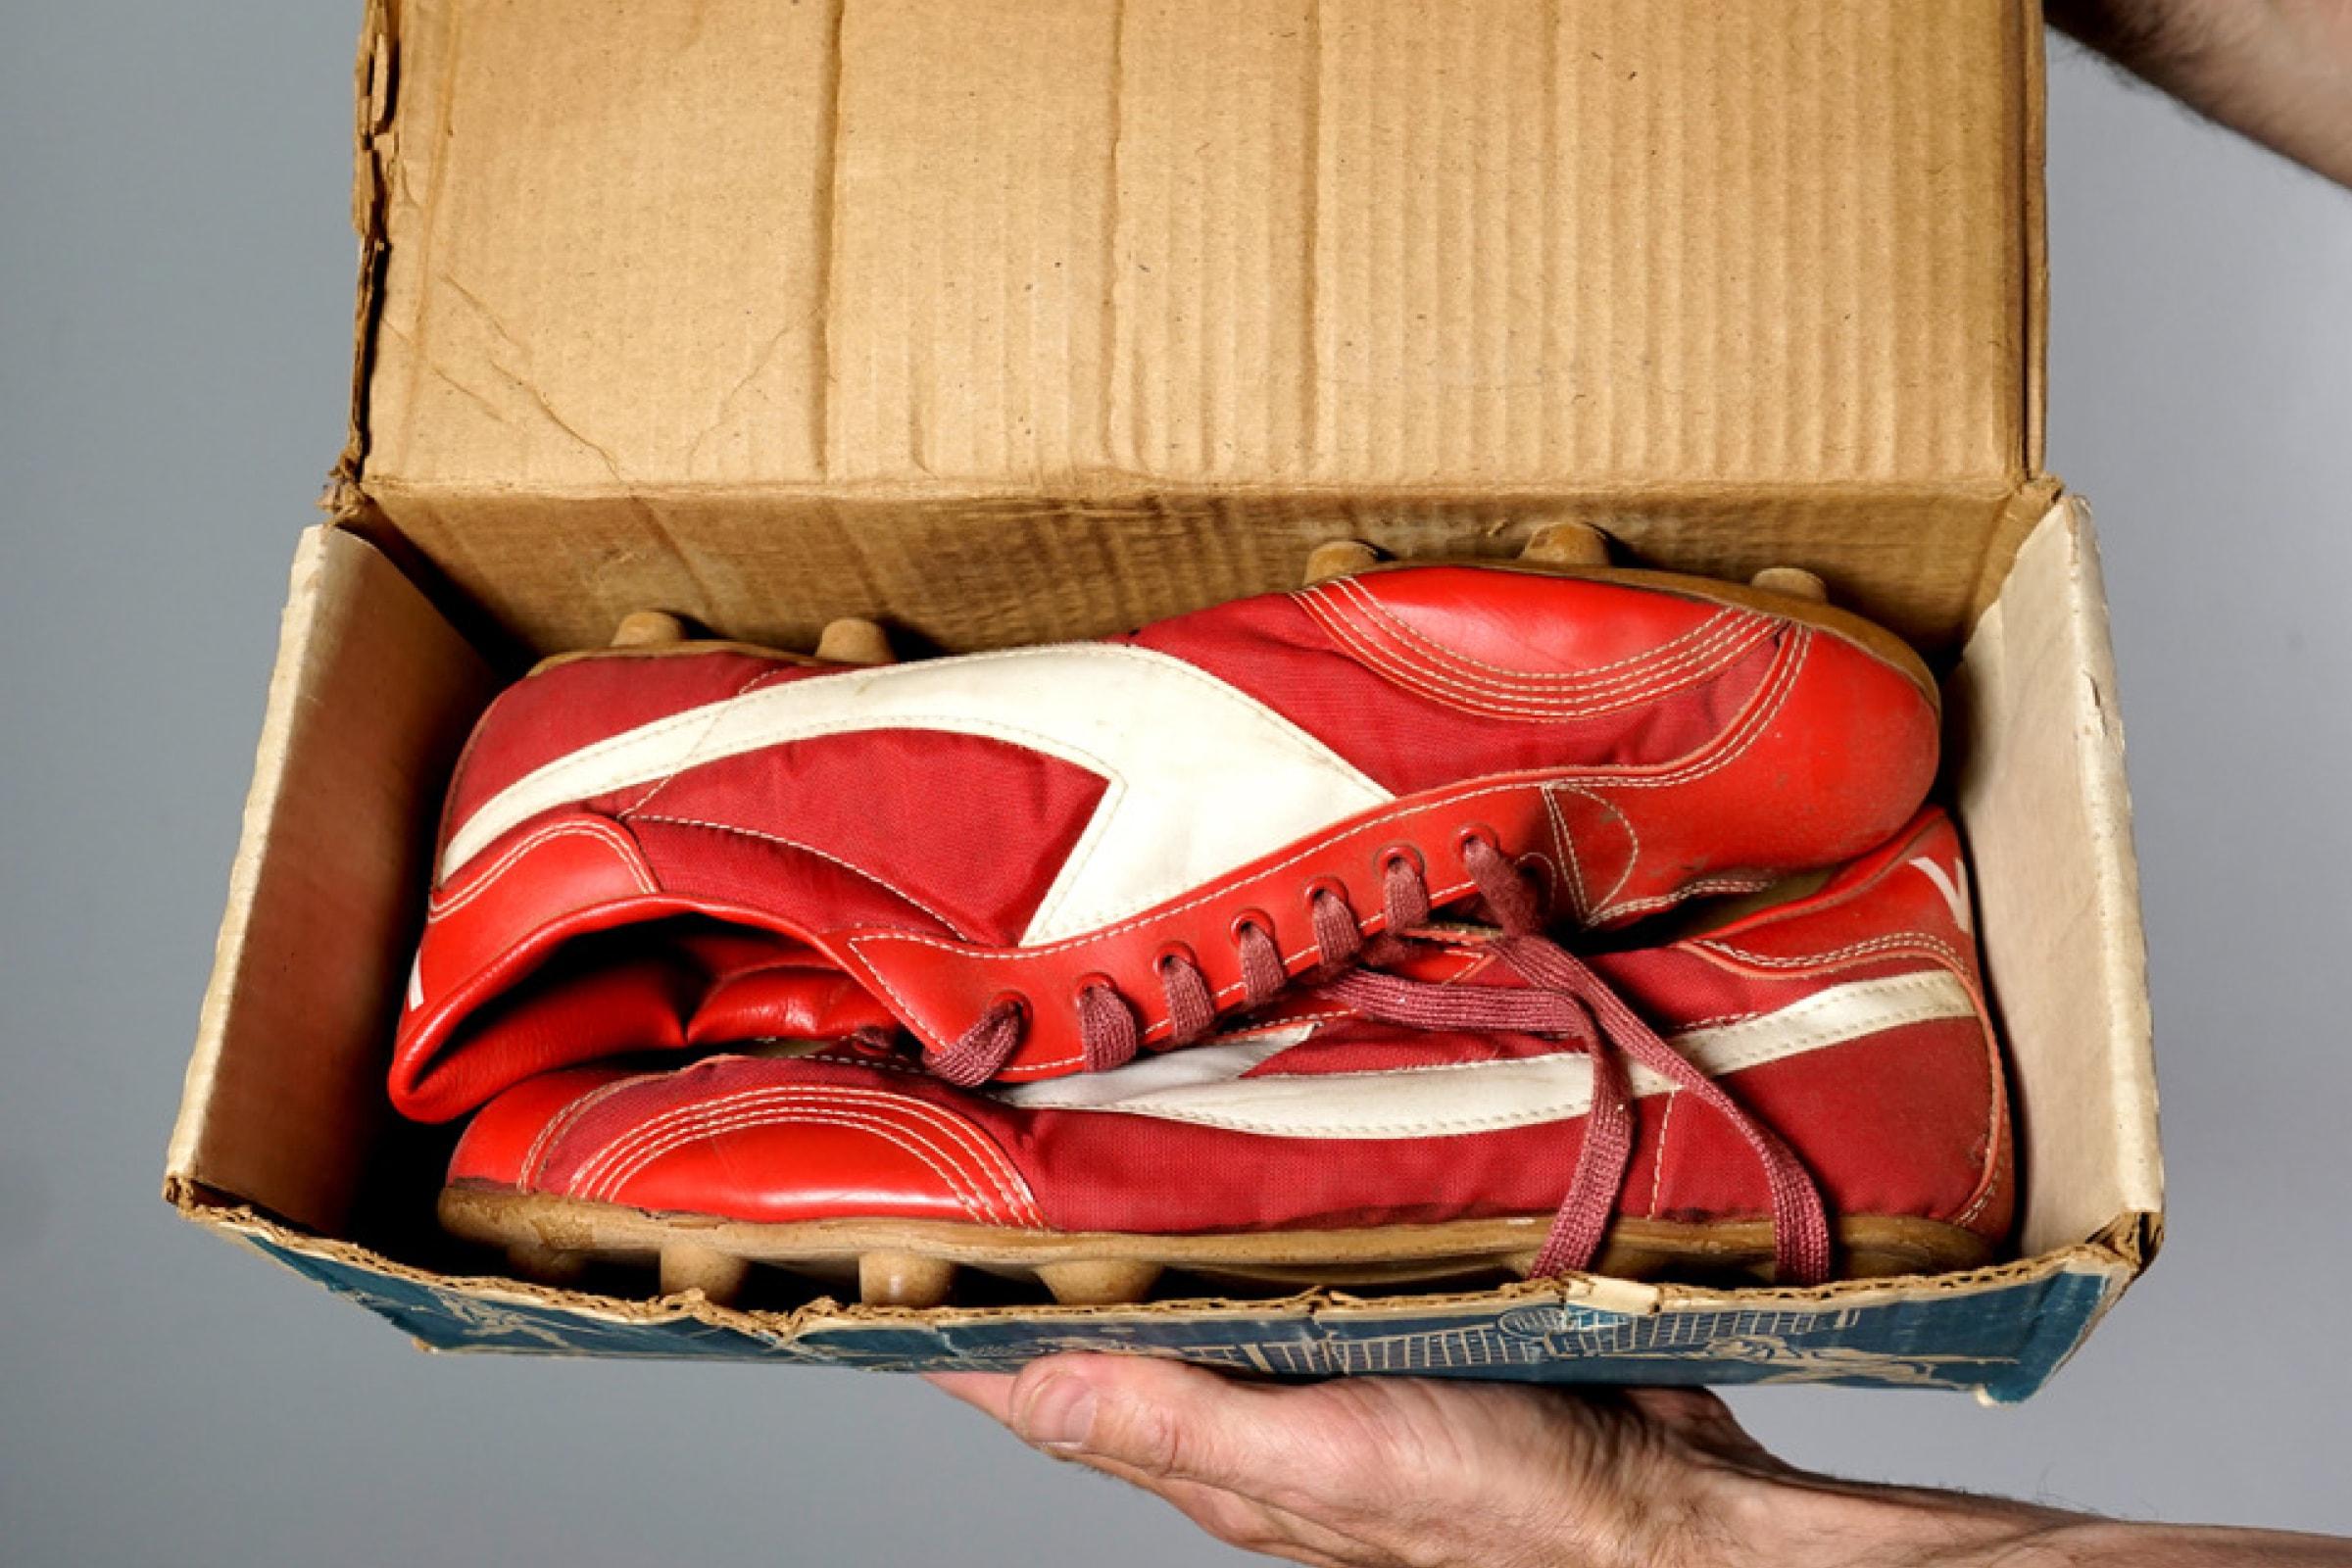 Vans football boots